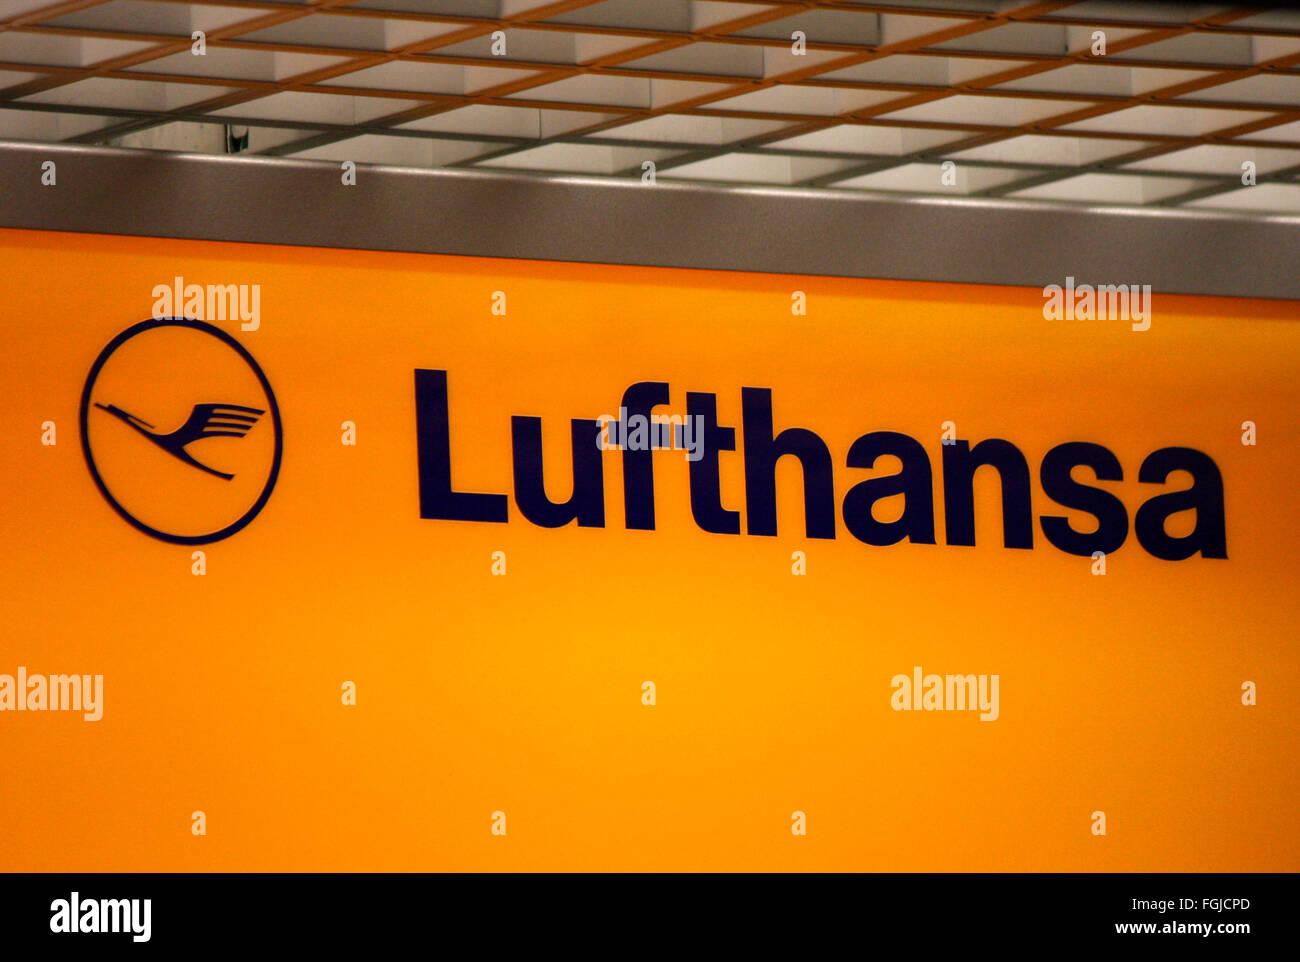 Markenname: 'Lufthansa', Berlin. - Stock Image